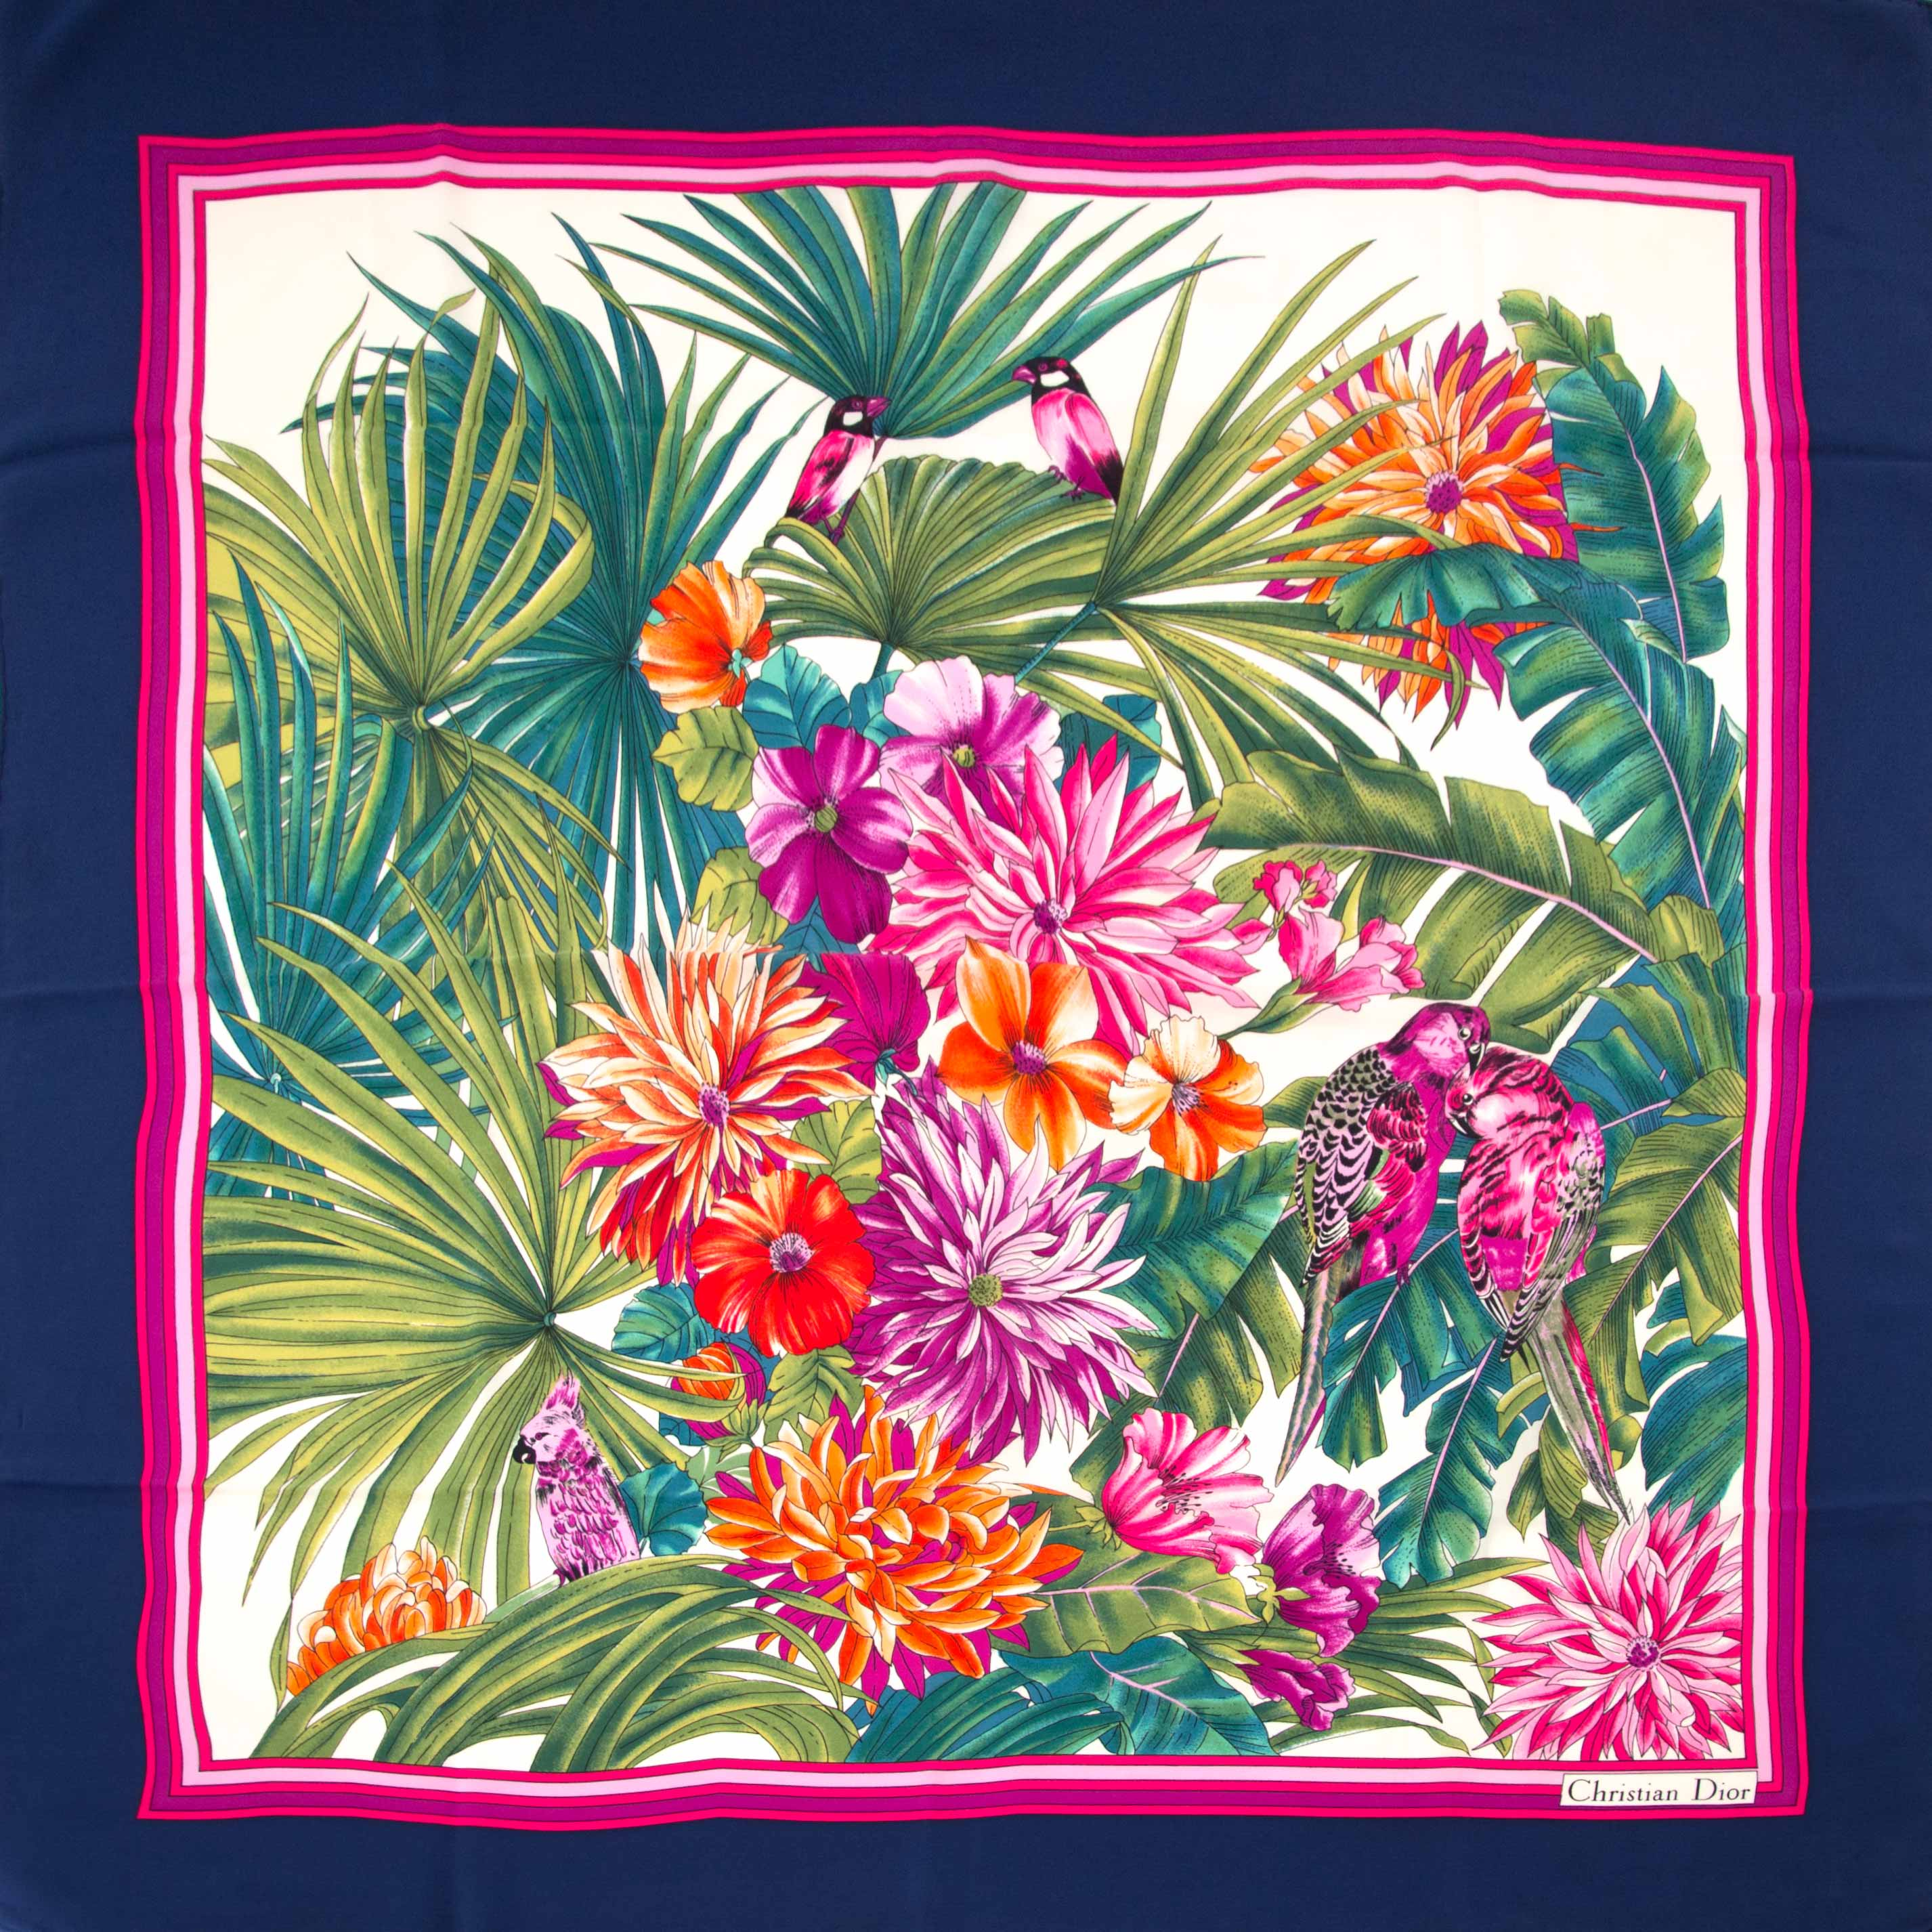 koop nu veilig online jouw tweedehands Christian Dior Dark Blue and Pink Flowers Scarf op labellov.com